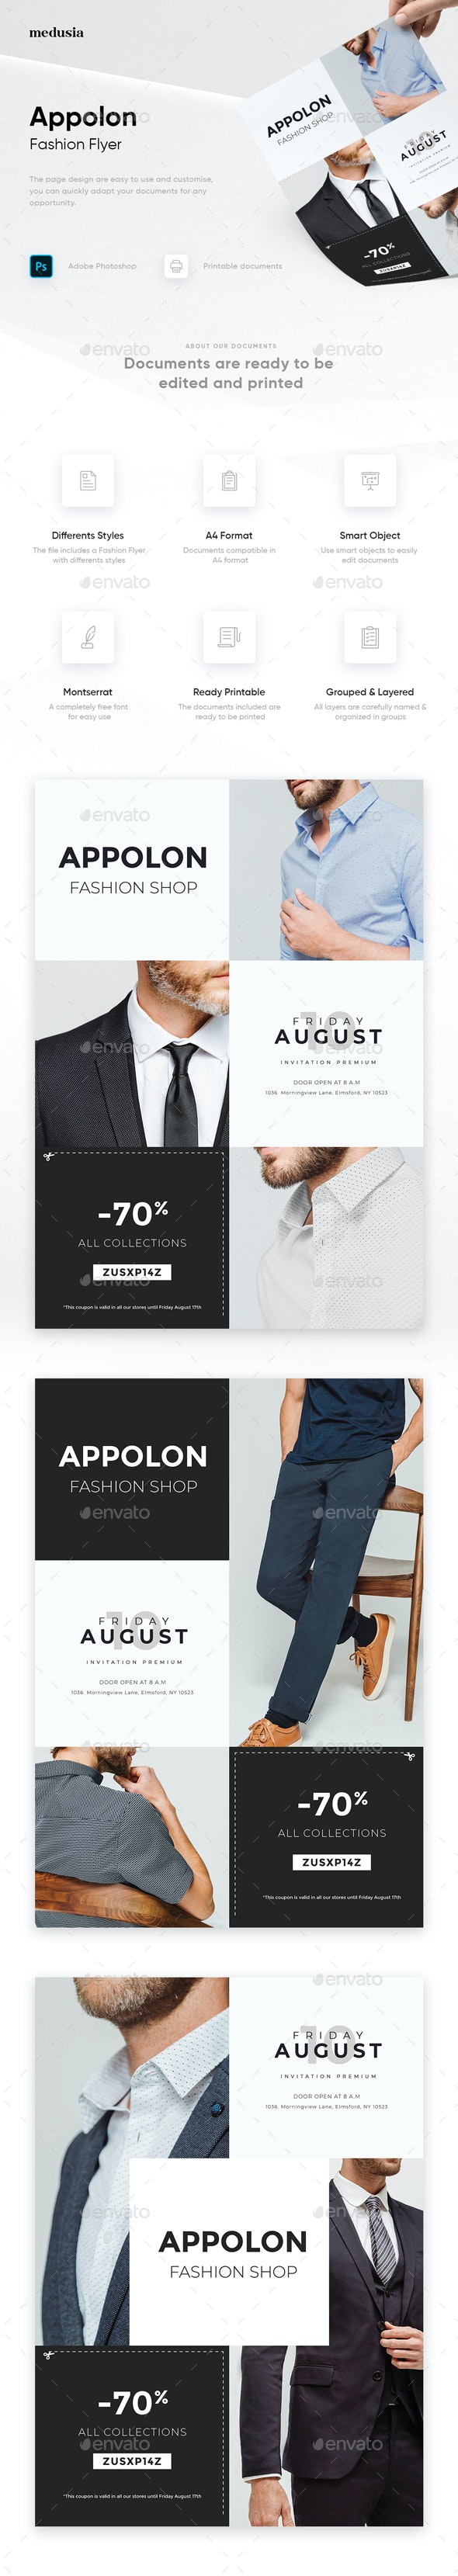 Appolon - Fashion Flyer - Flyers Print Templates